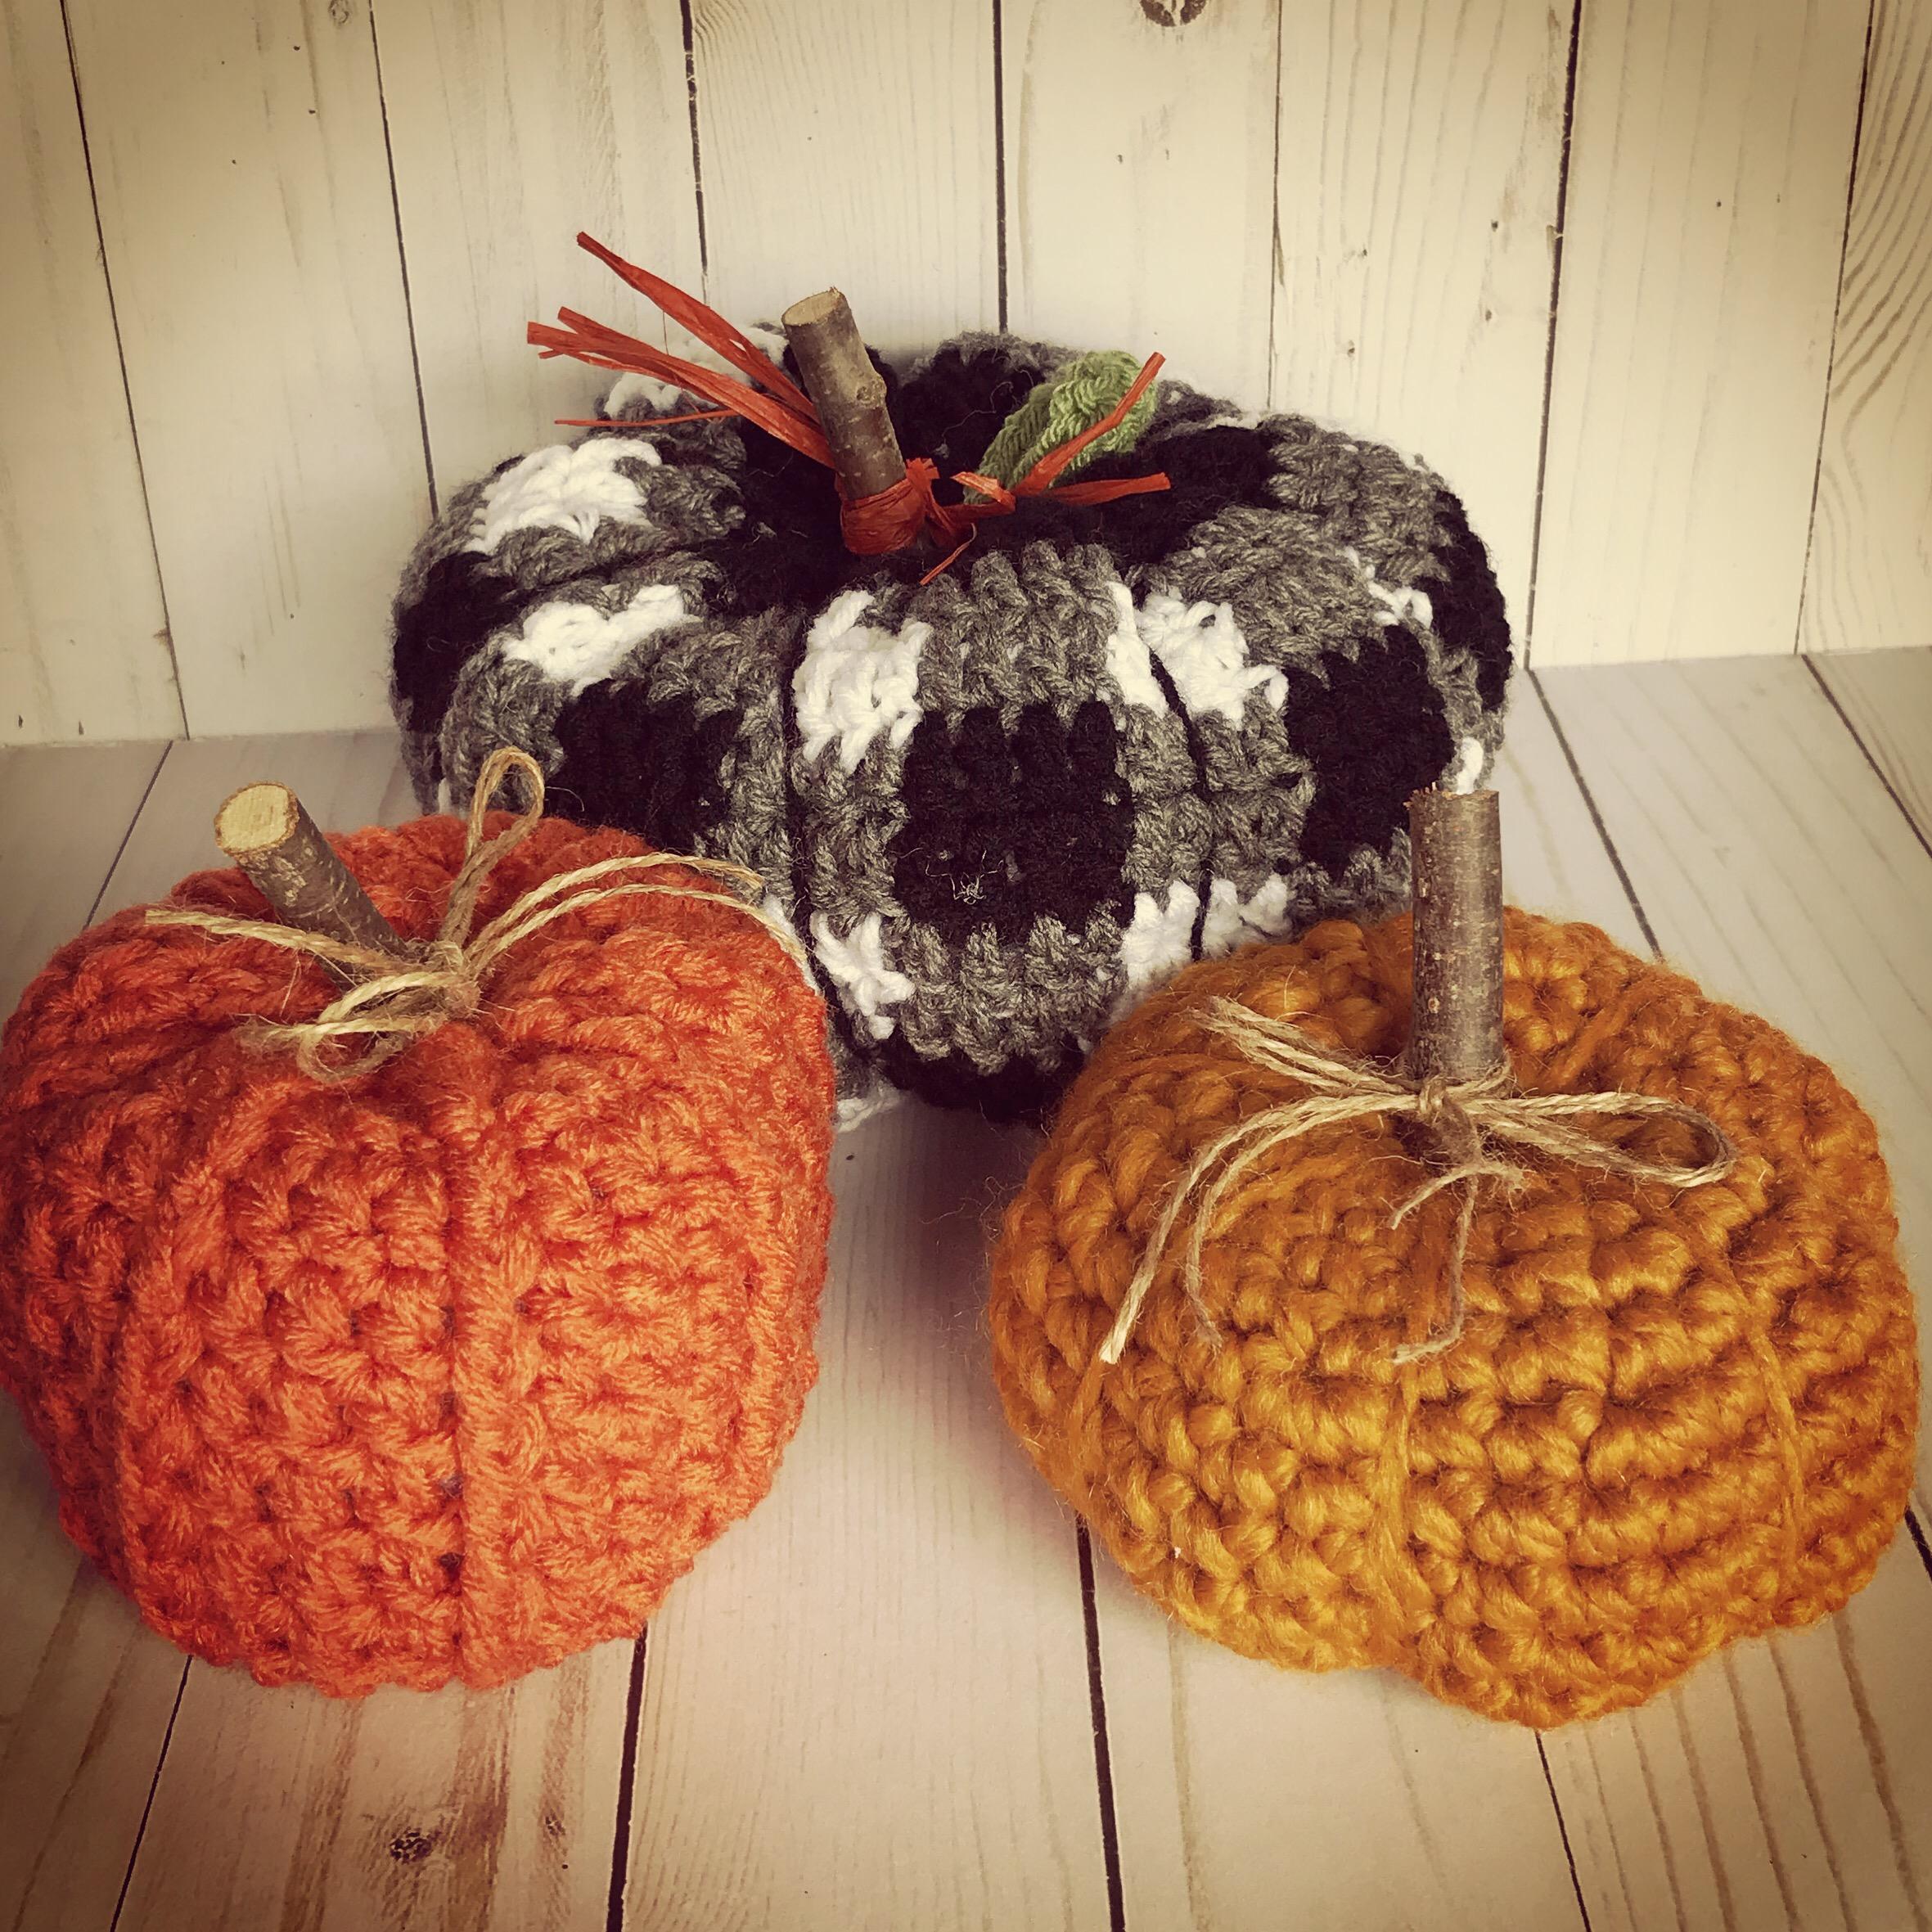 Farmhouse Homemade Country Crochet Pumpkins